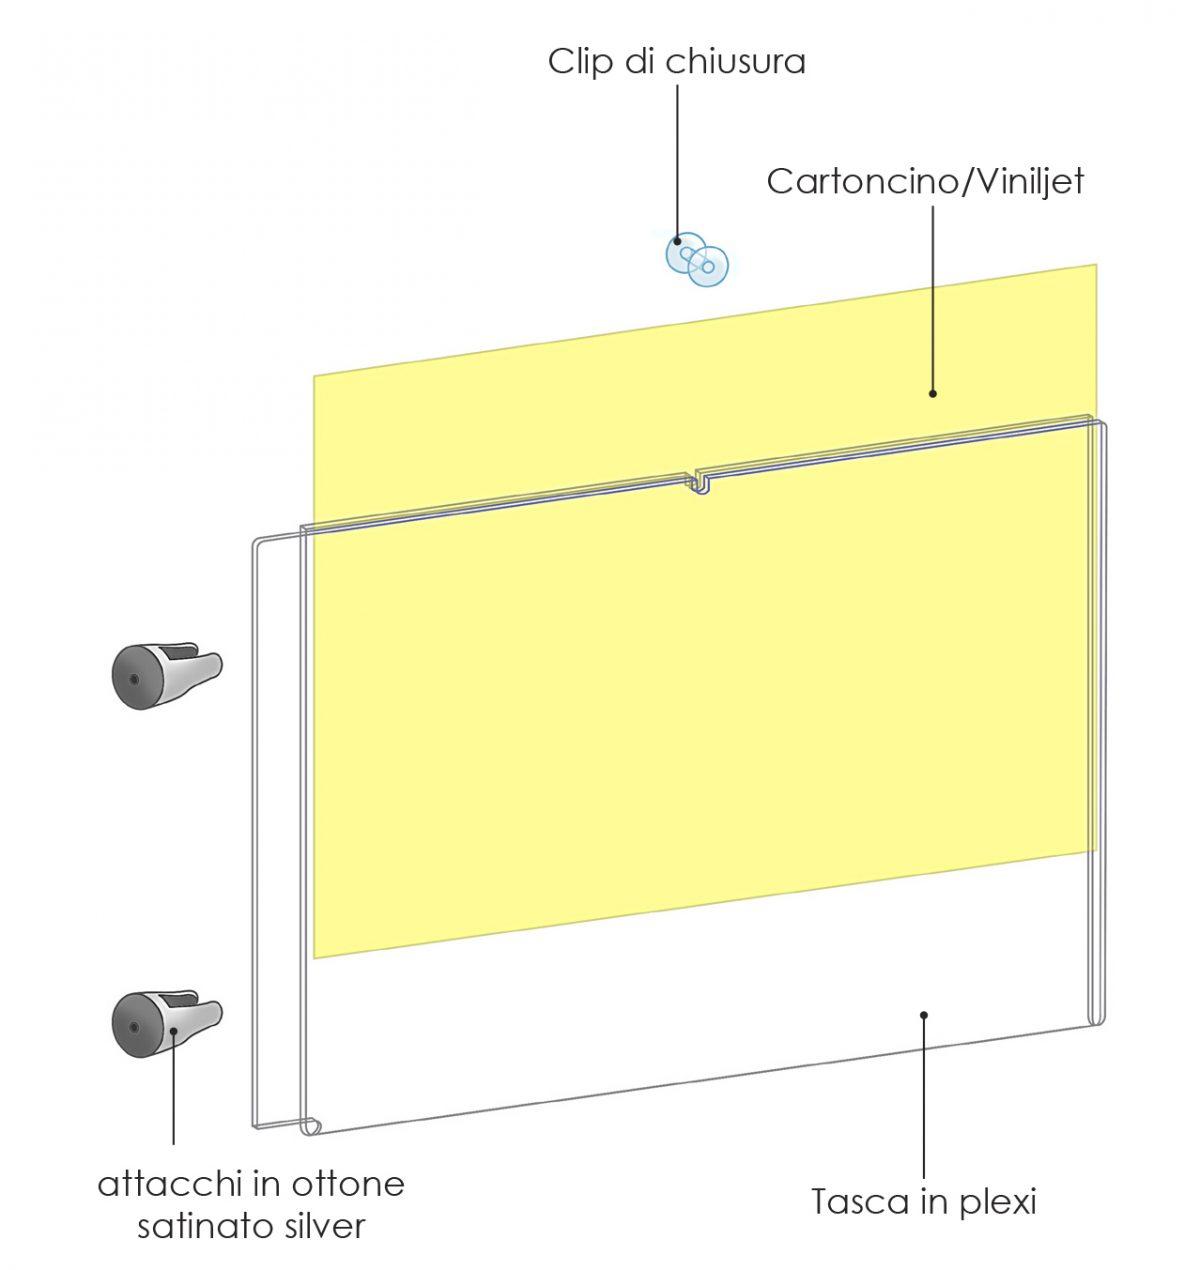 Divisori In Plexiglass Per Esterni targhe in plexiglass per segnaletica aziendale e studi